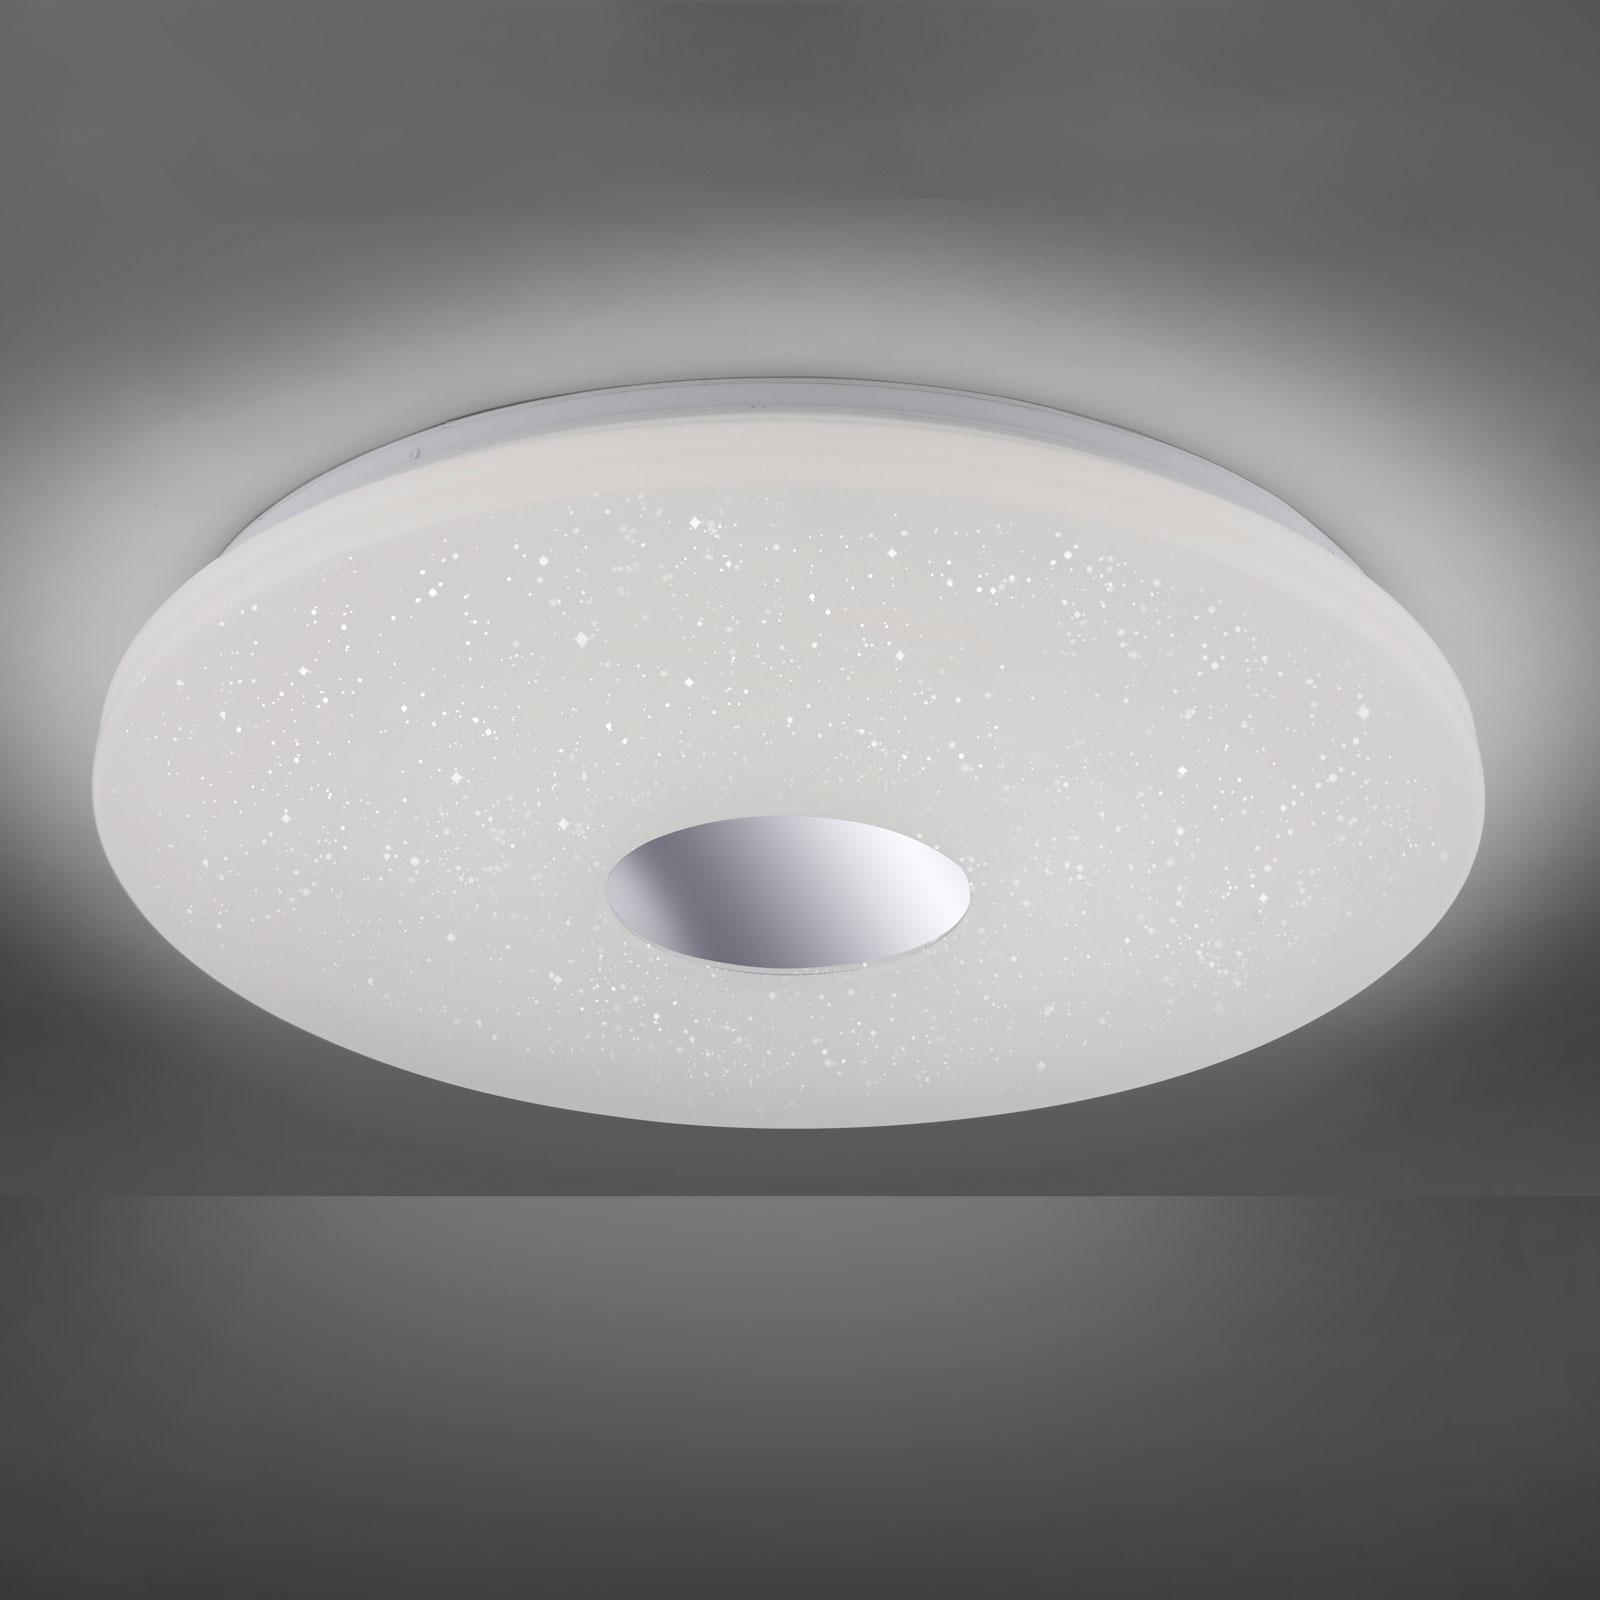 LED plafondlamp Lavinia met sensor 60cm